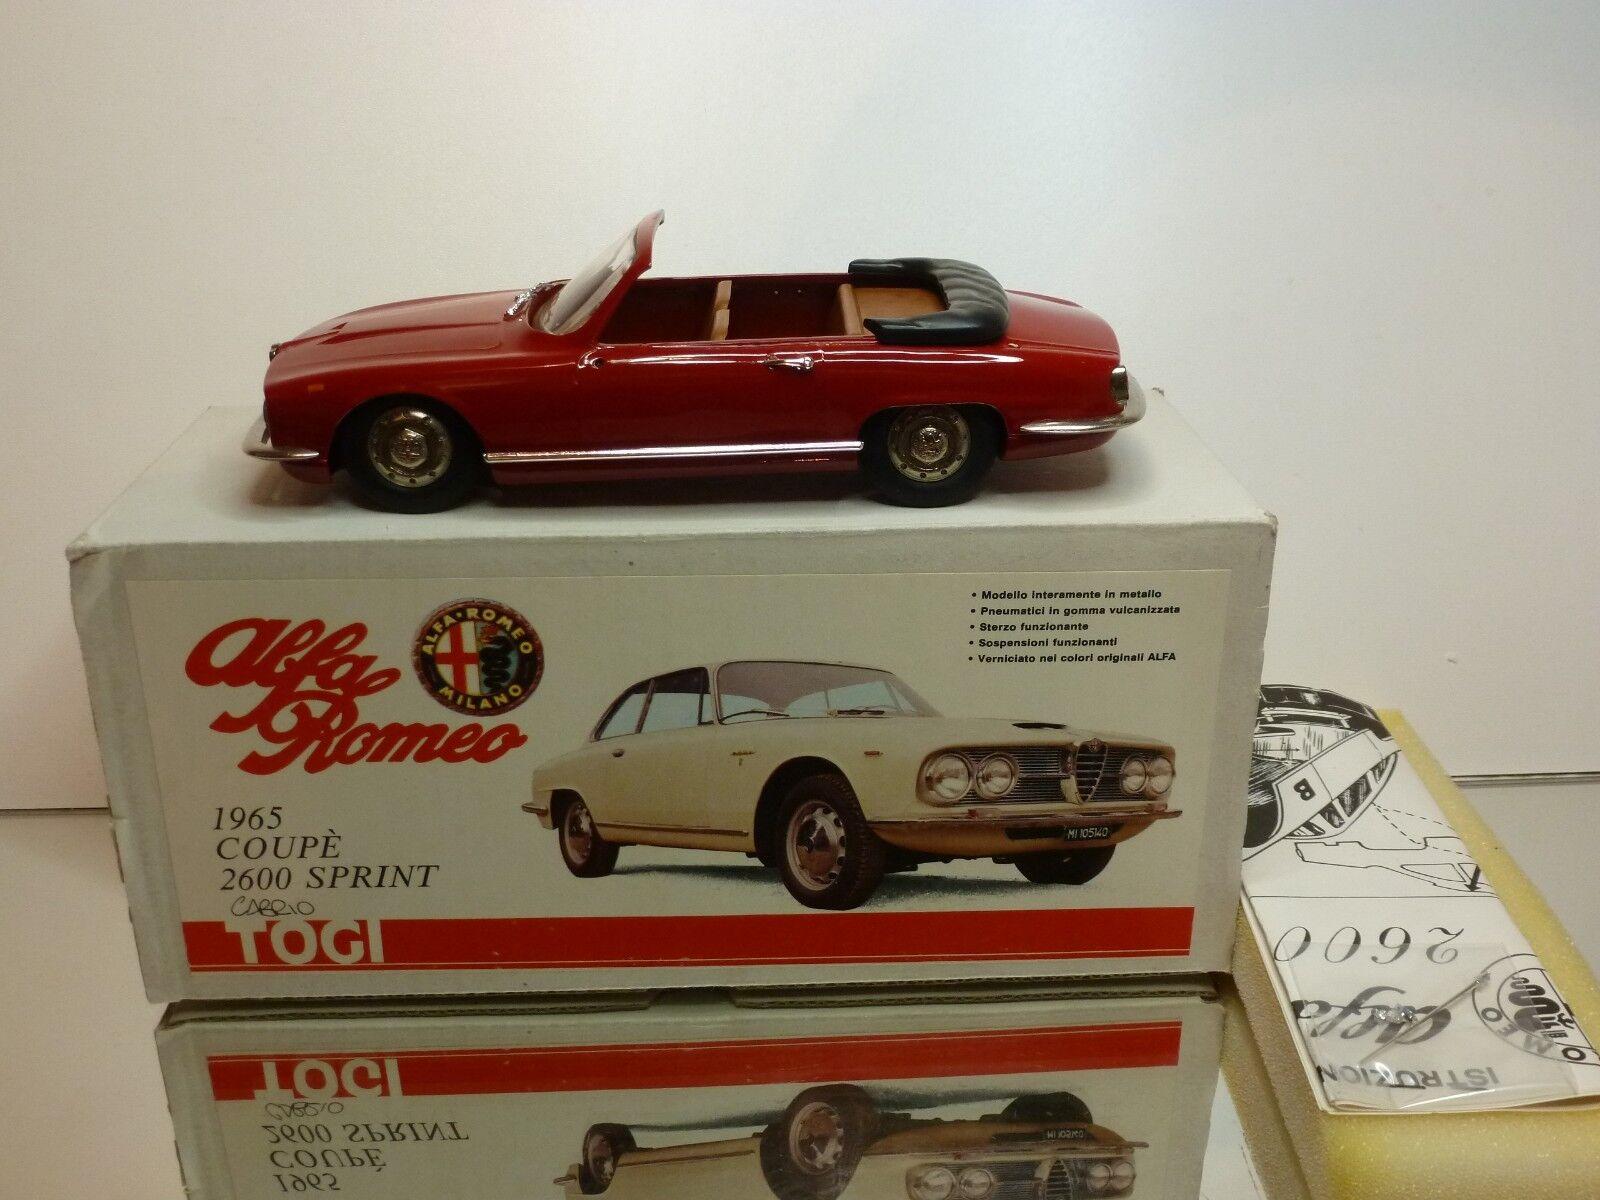 TOGI 6 61 ALFA ROMEO 2600 CABRIOLET 1965 - rojo 1 23 RARE  - EXCELLENT IN BOX